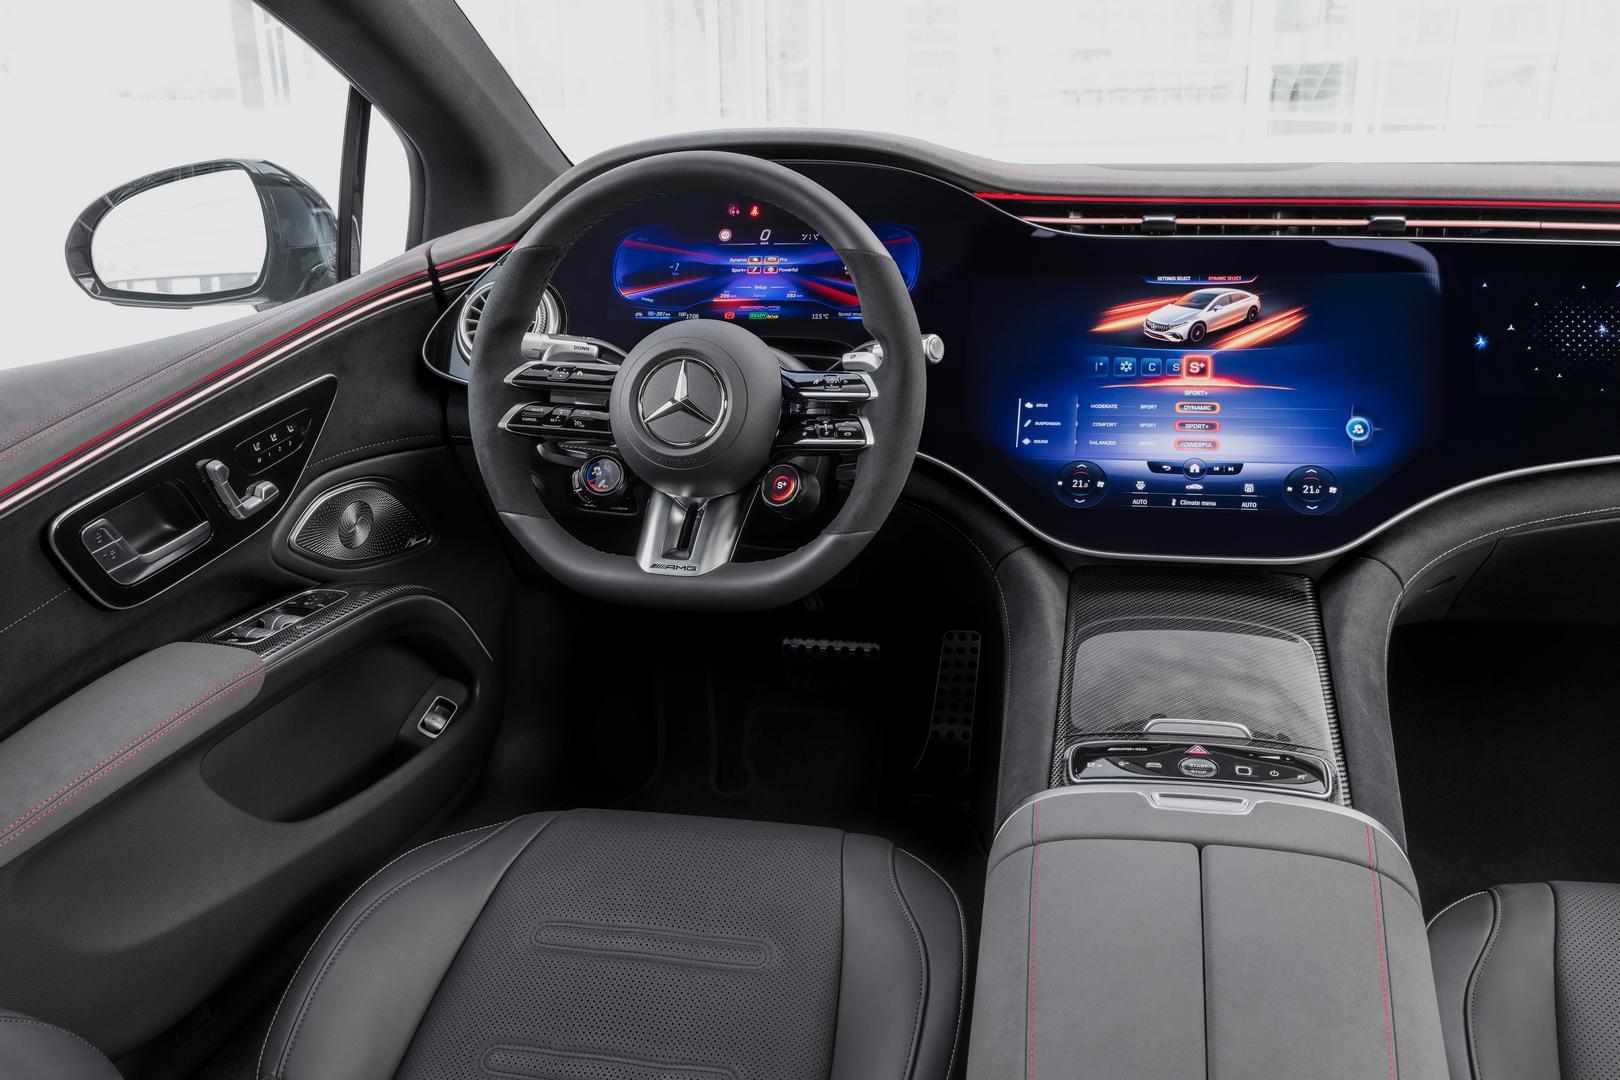 Mercedes-AMG EQS 53 4MATIC+, 2021Mercedes-AMG EQS 53 cabin